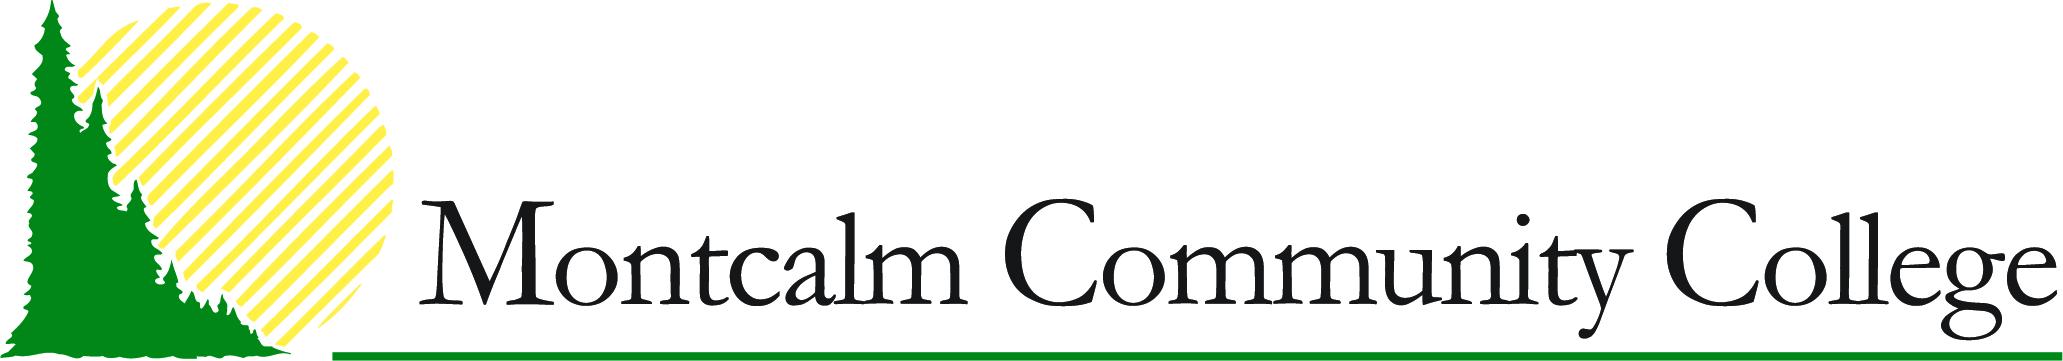 Montcalm Community College Logo